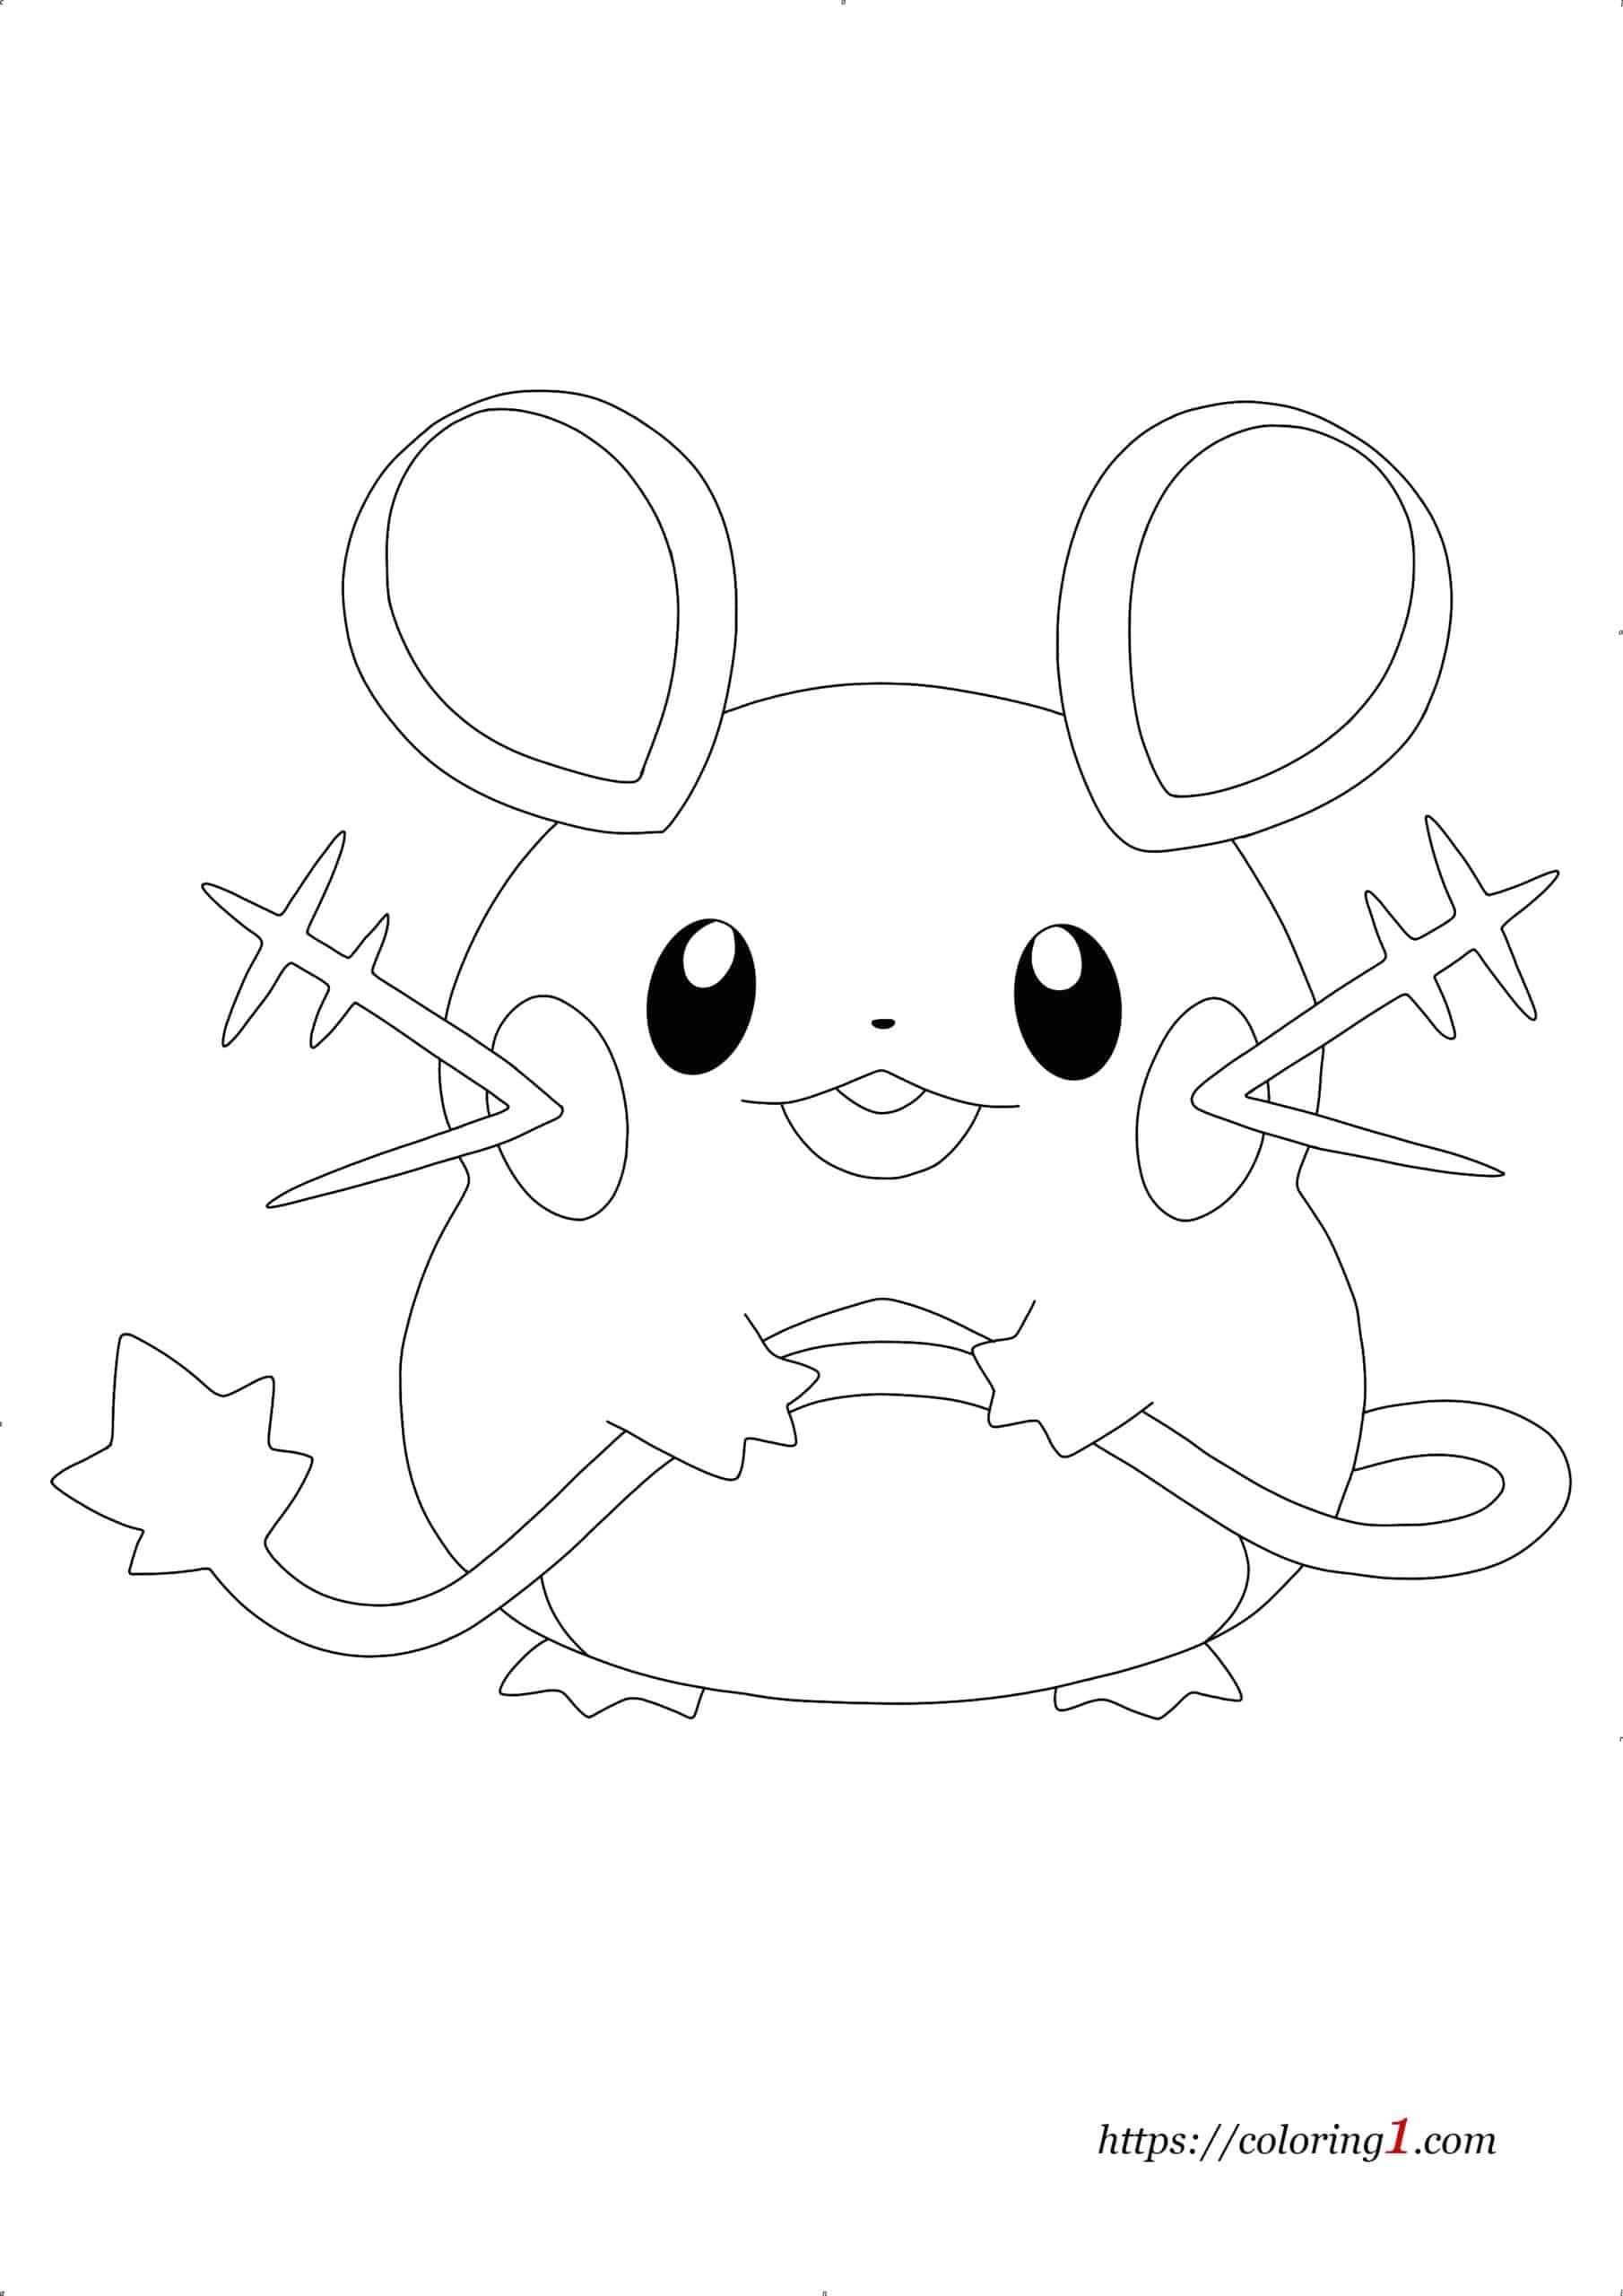 Coloriage Pokemon Alola Dedenne